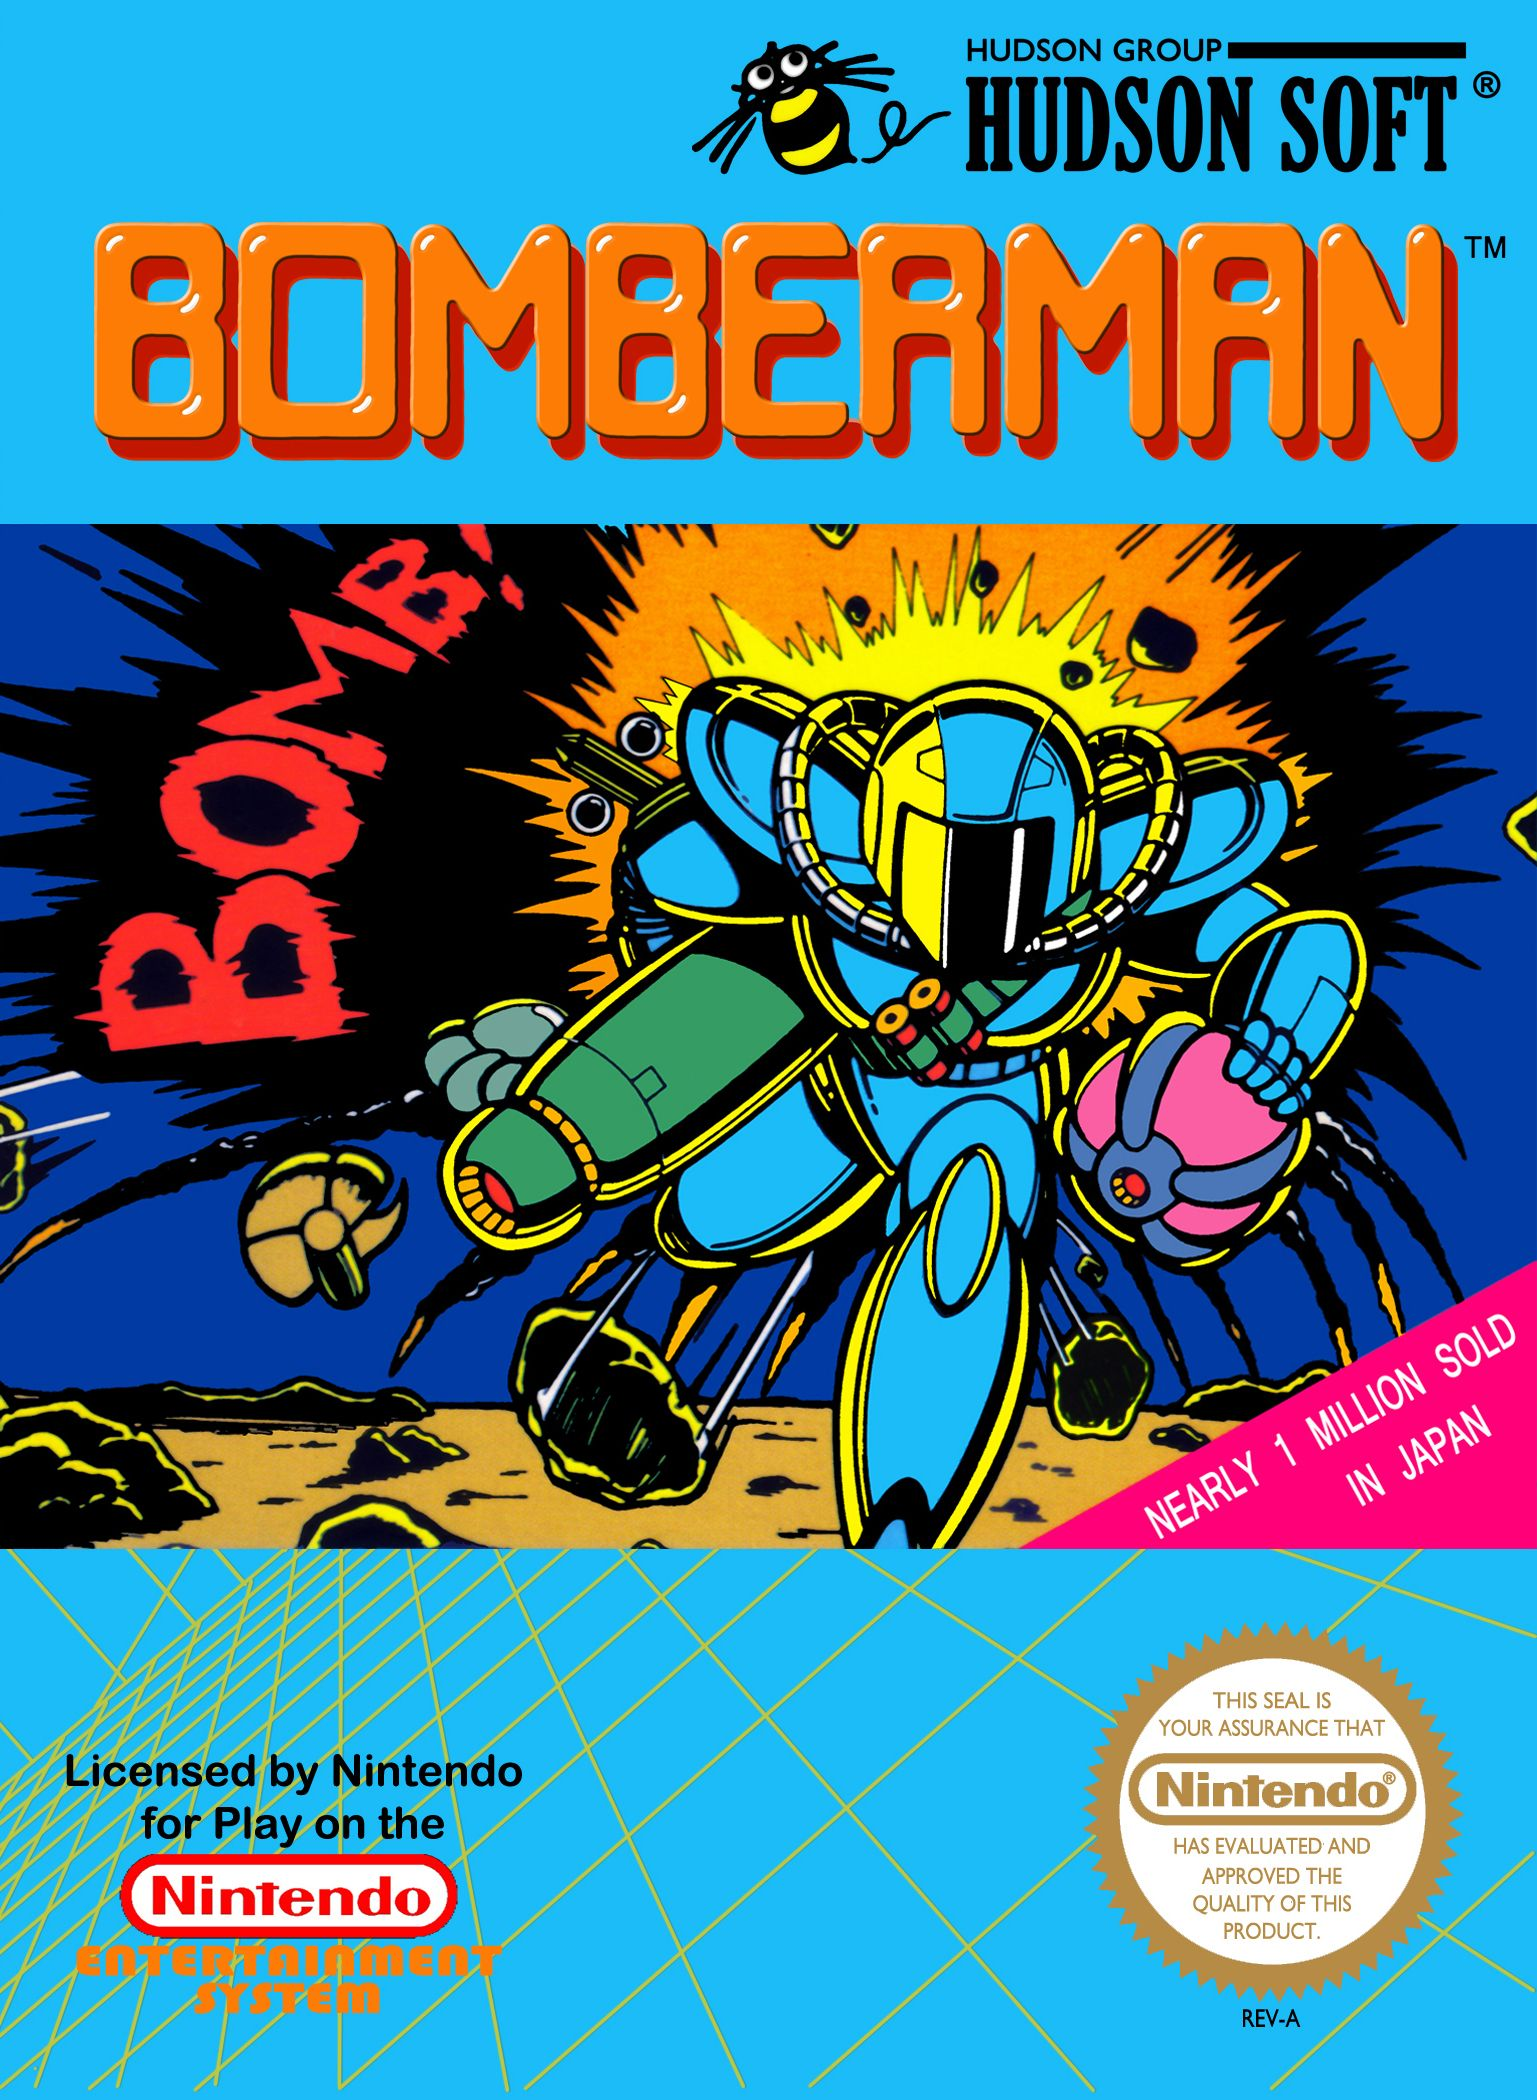 Bomberman Nes Hudson Soft 1989 Nes Games Classic Video